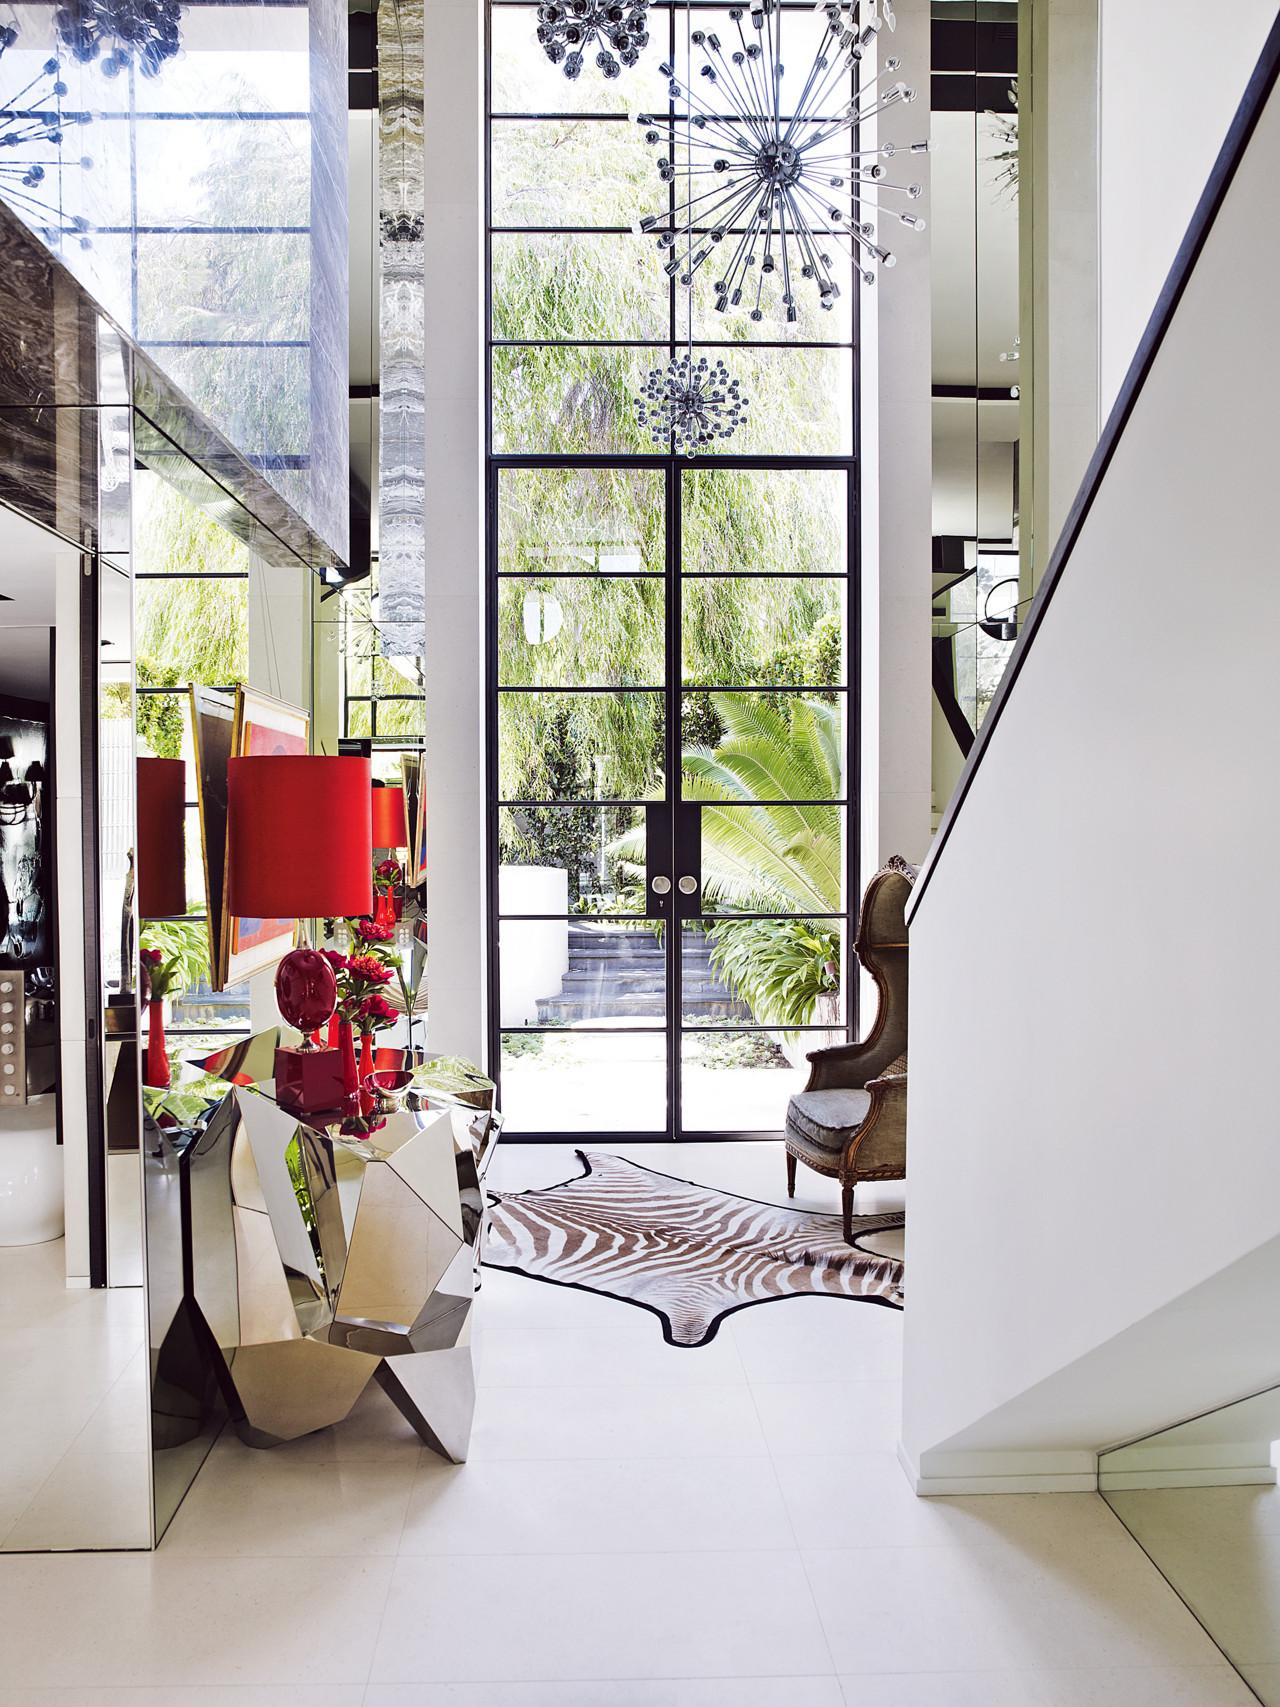 Perth home by Christian Lyon